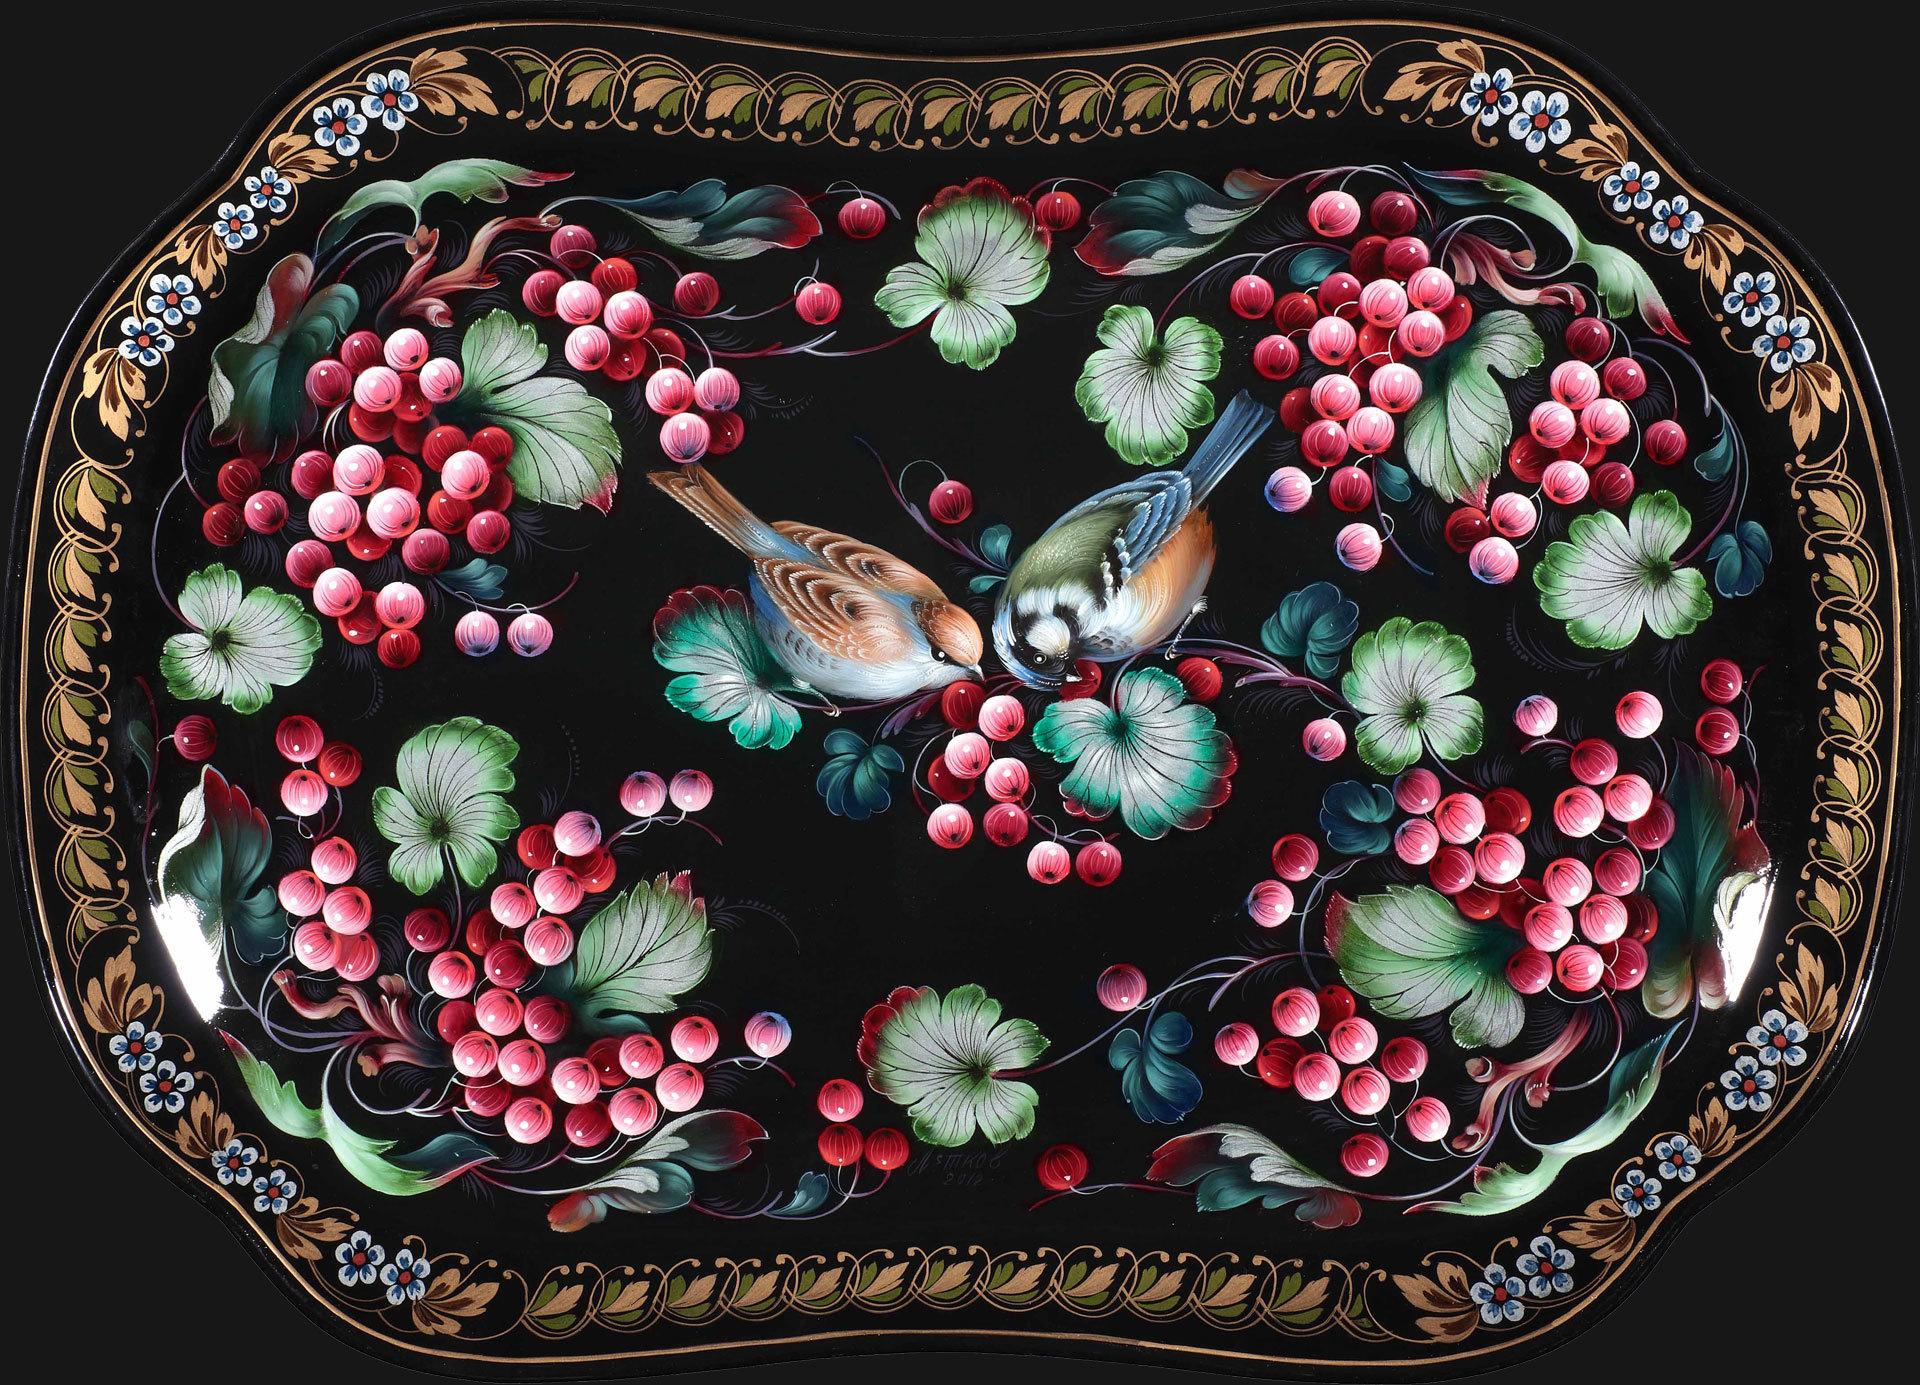 In the gooseberry